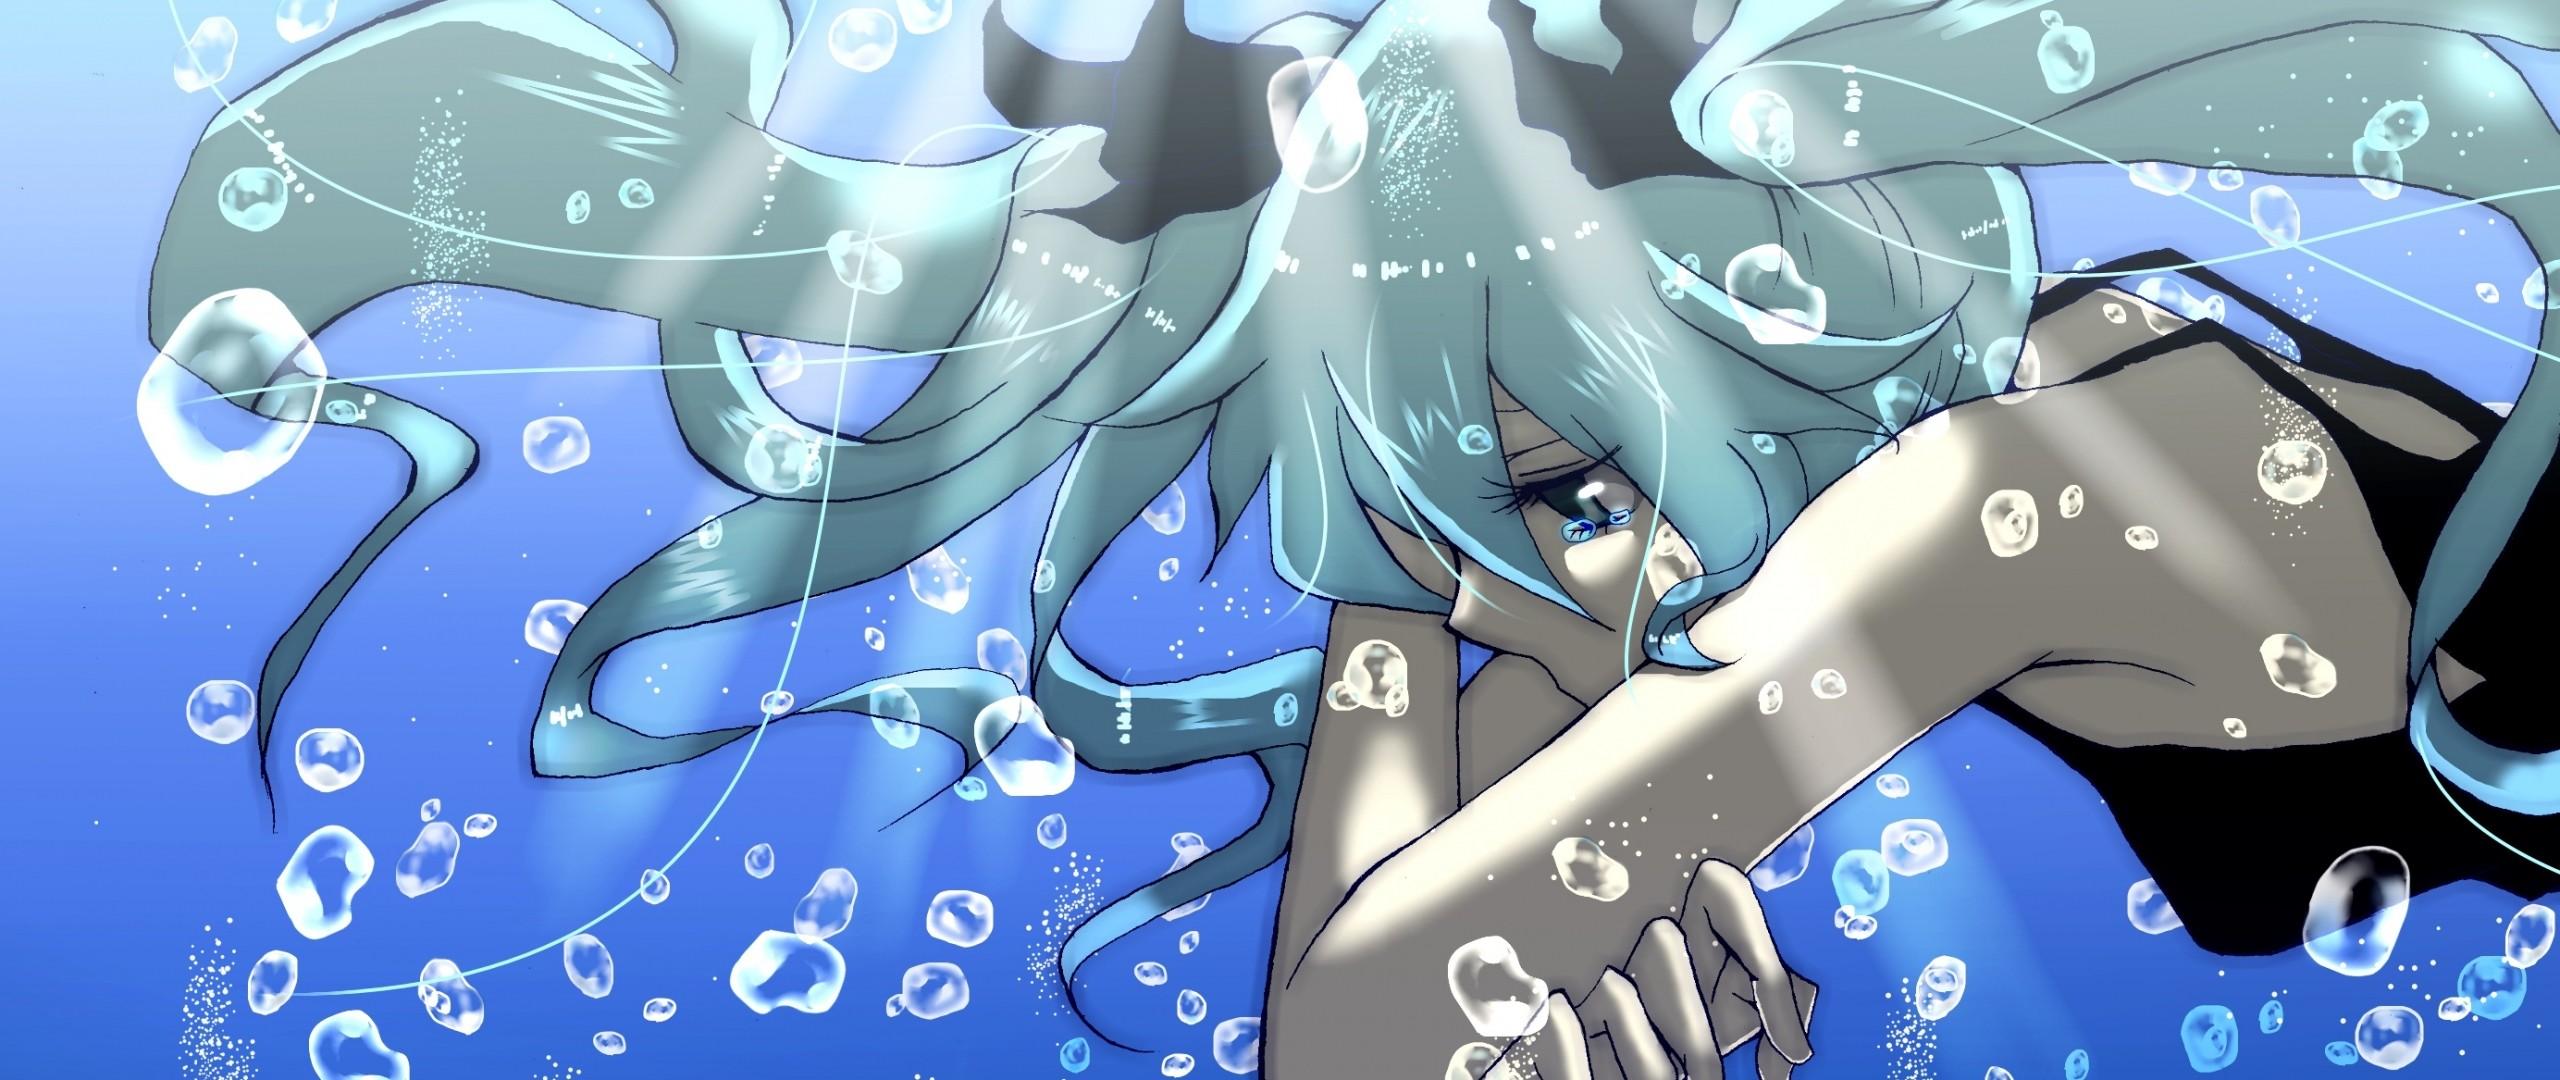 Wallpaper anime, girl, water, bubbles, sadness